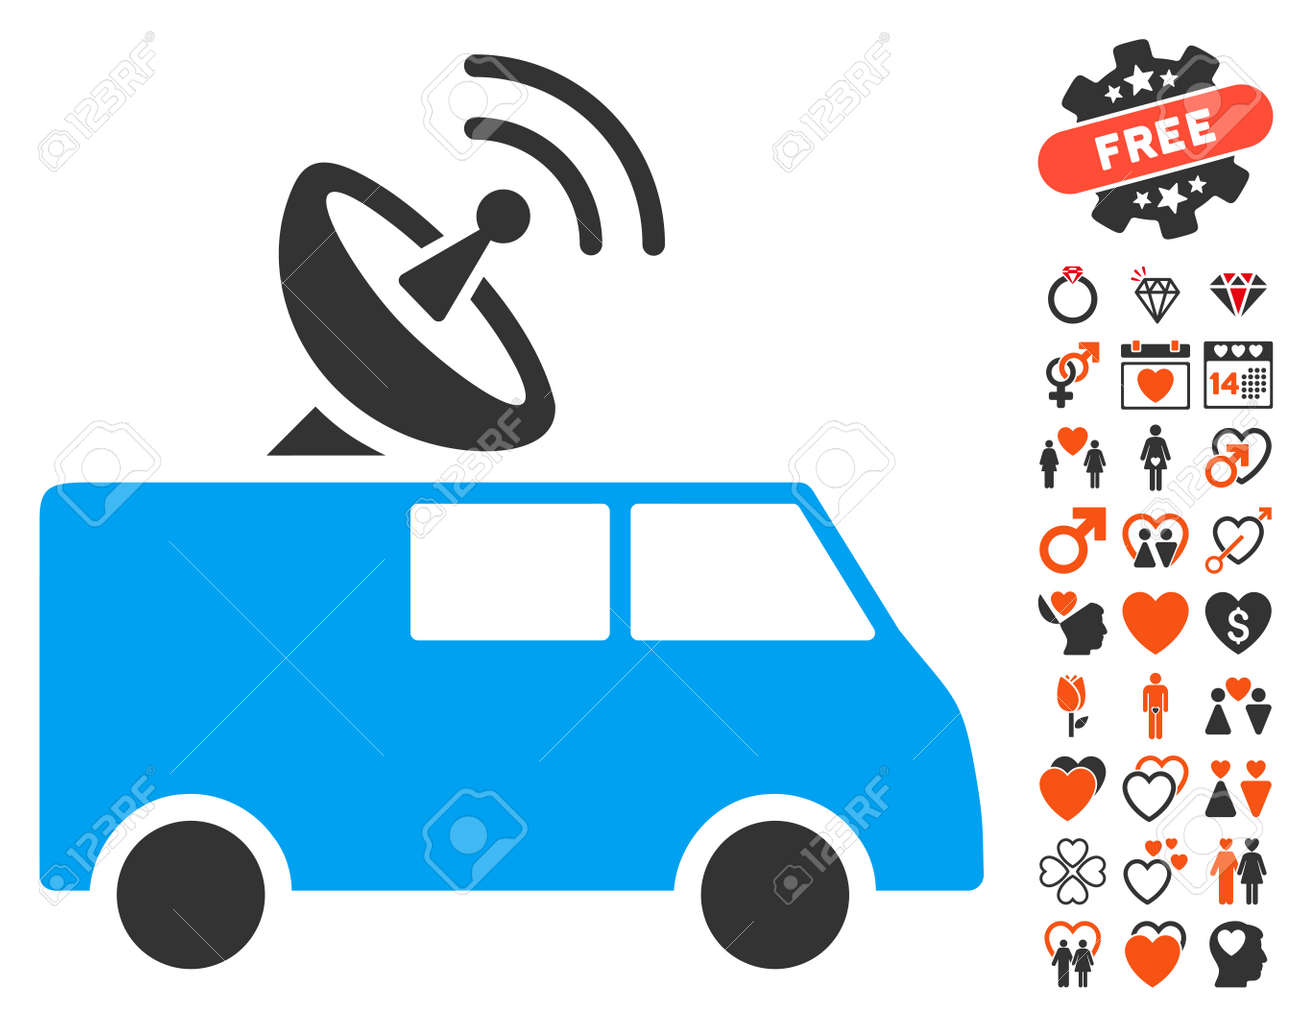 Radio Control Car Icon With Bonus Amour Symbols Vector Illustration